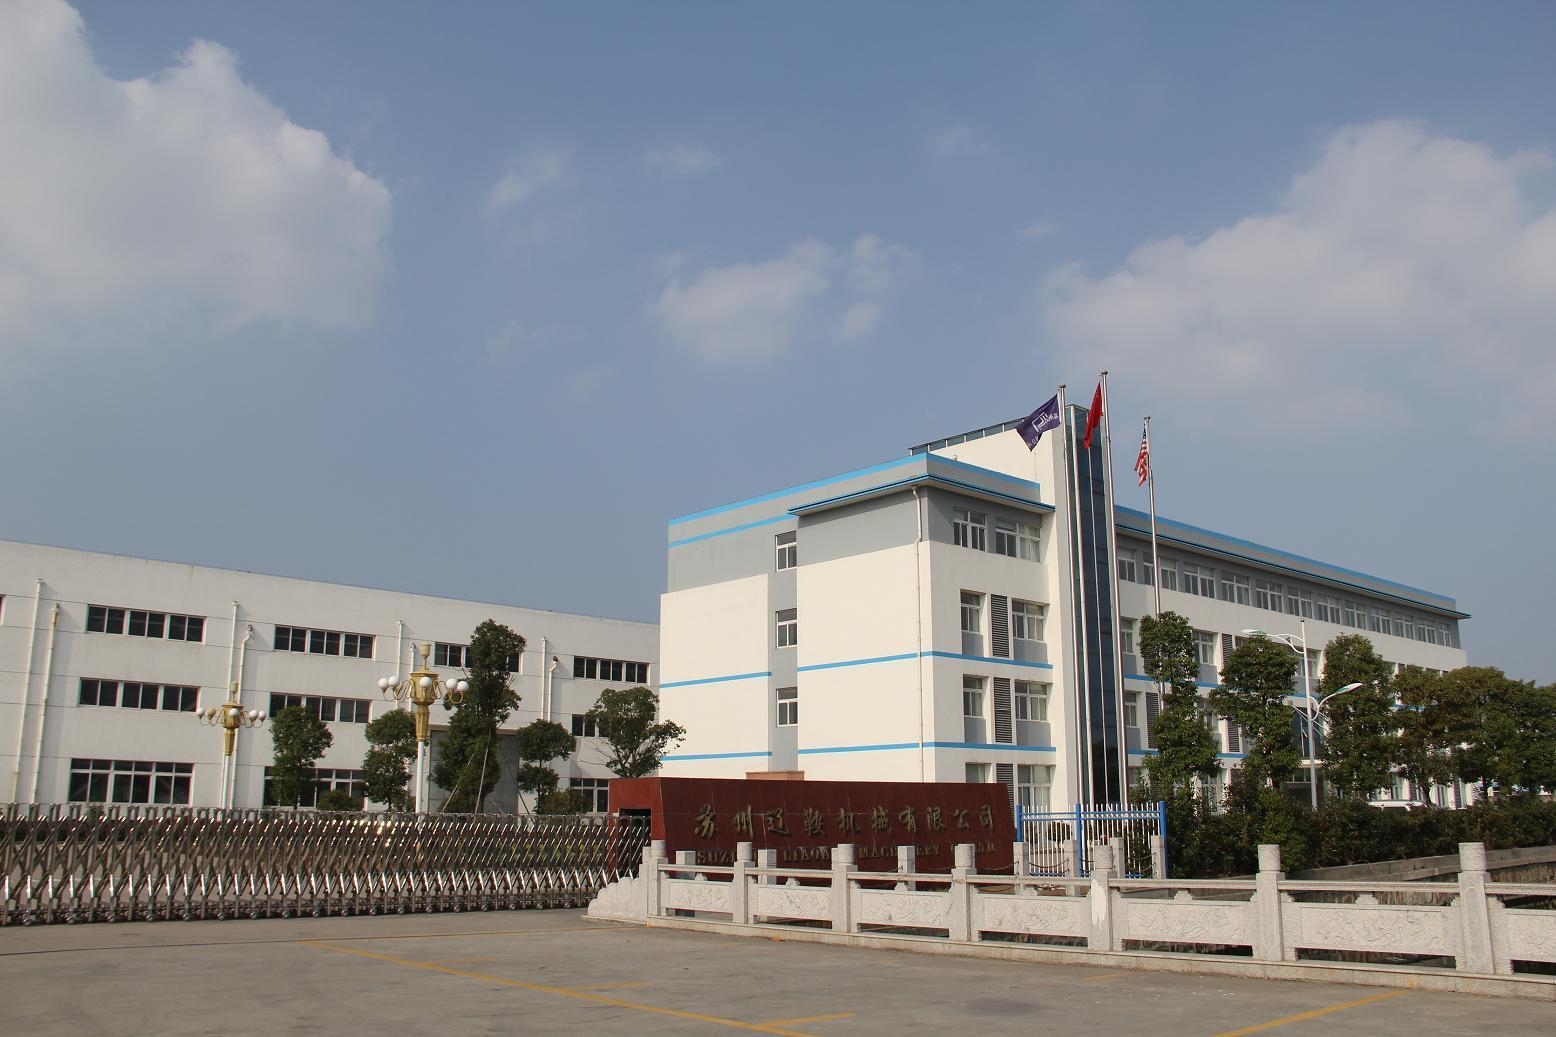 China Supplier Lla Manufacture Track Shoe Dozer